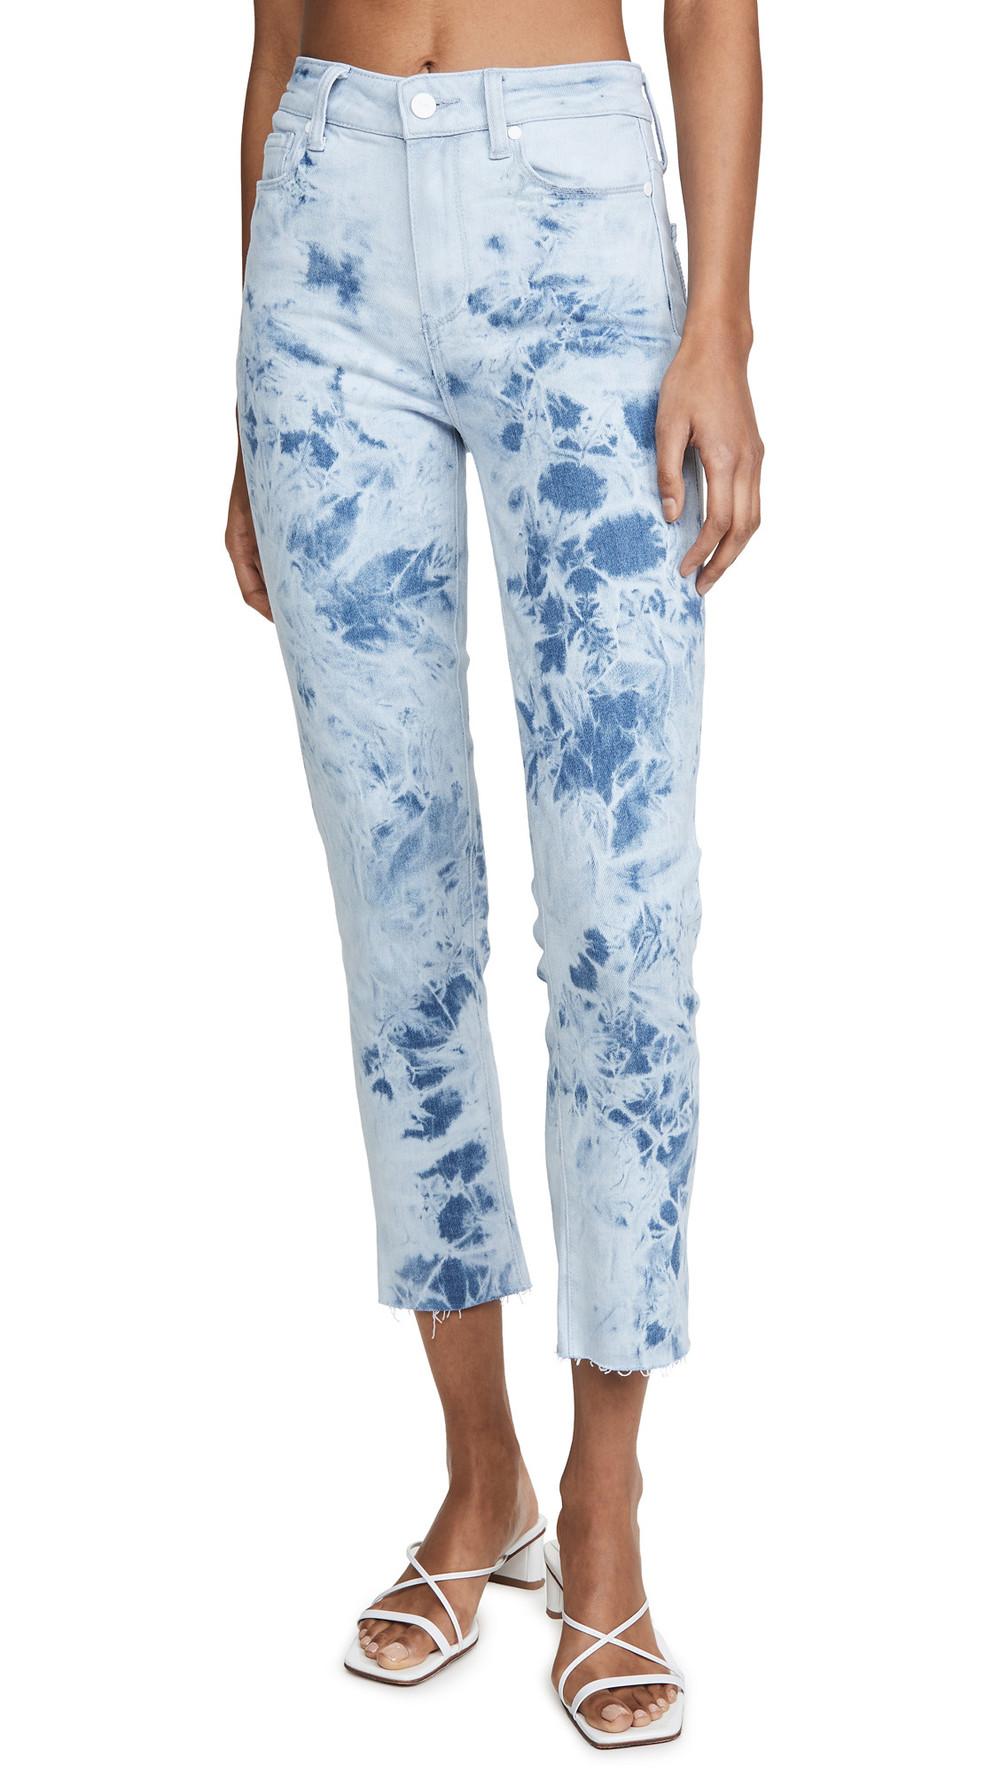 PAIGE Hoxton Slim Jeans in indigo